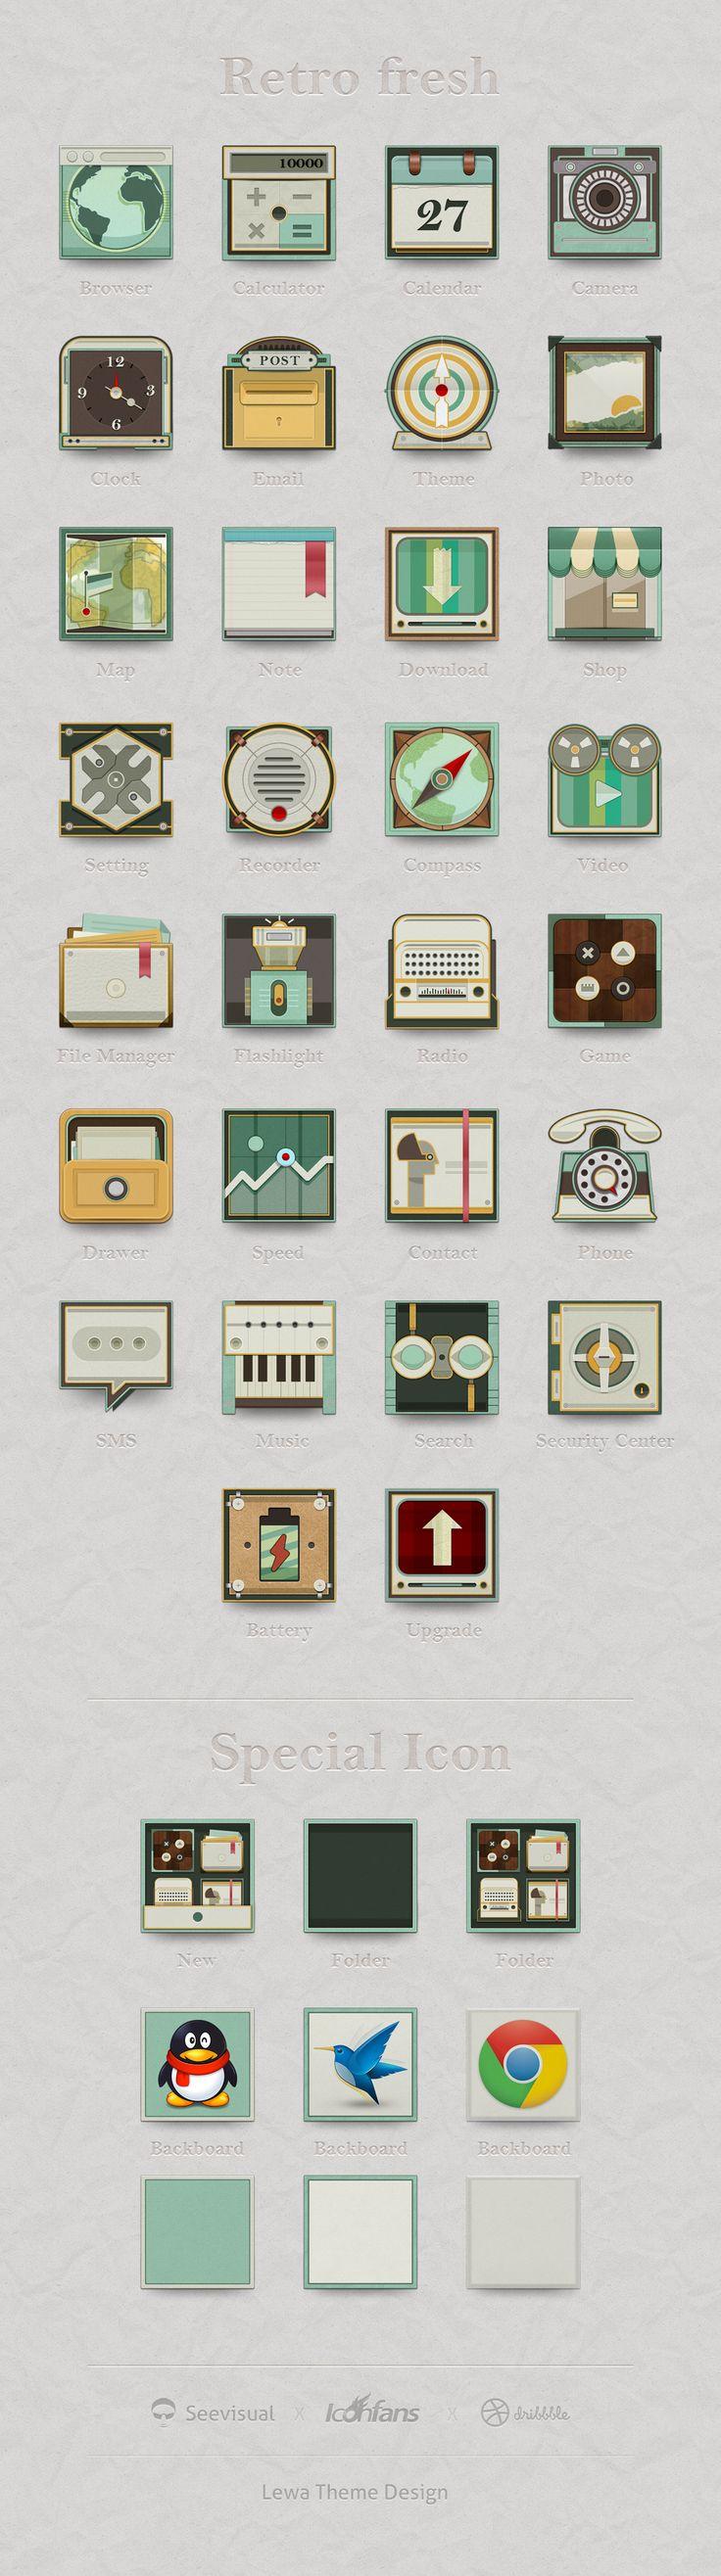 Lewa Theme design by see, via dribbble #icon